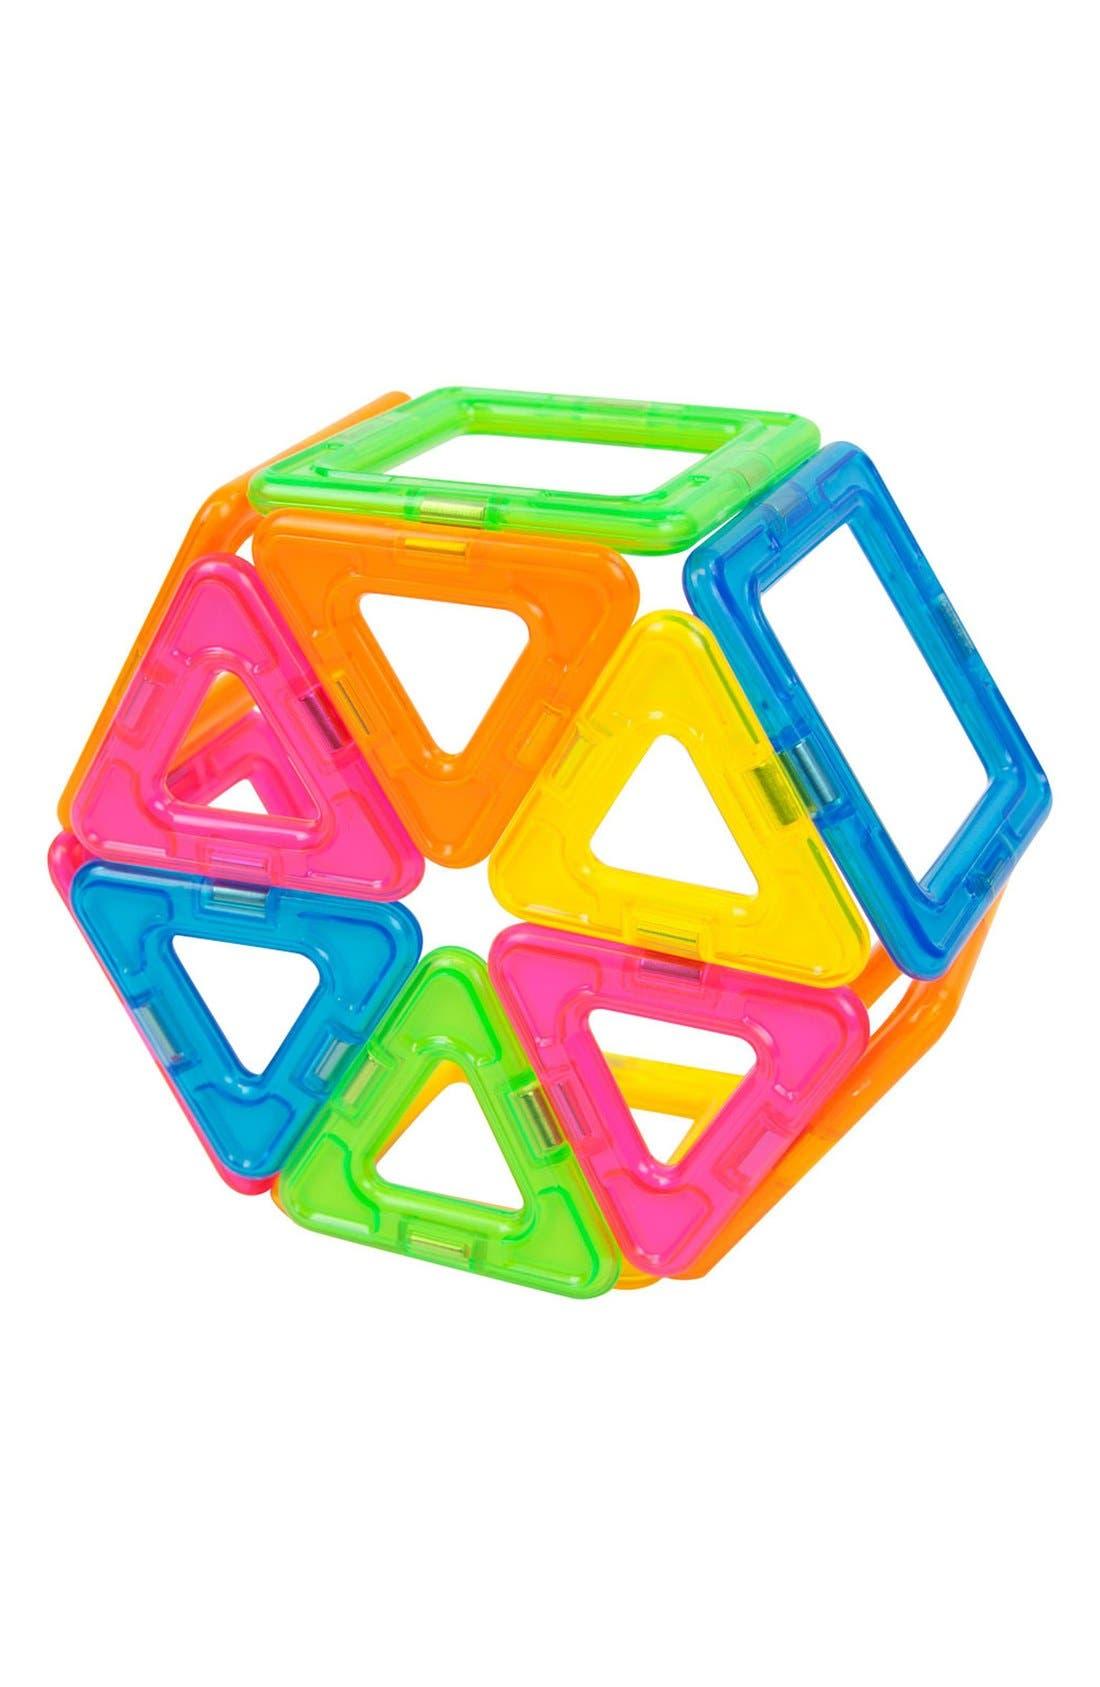 'Creator' Neon Magnetic 3D Construction Set,                             Alternate thumbnail 5, color,                             Neon Rainbow